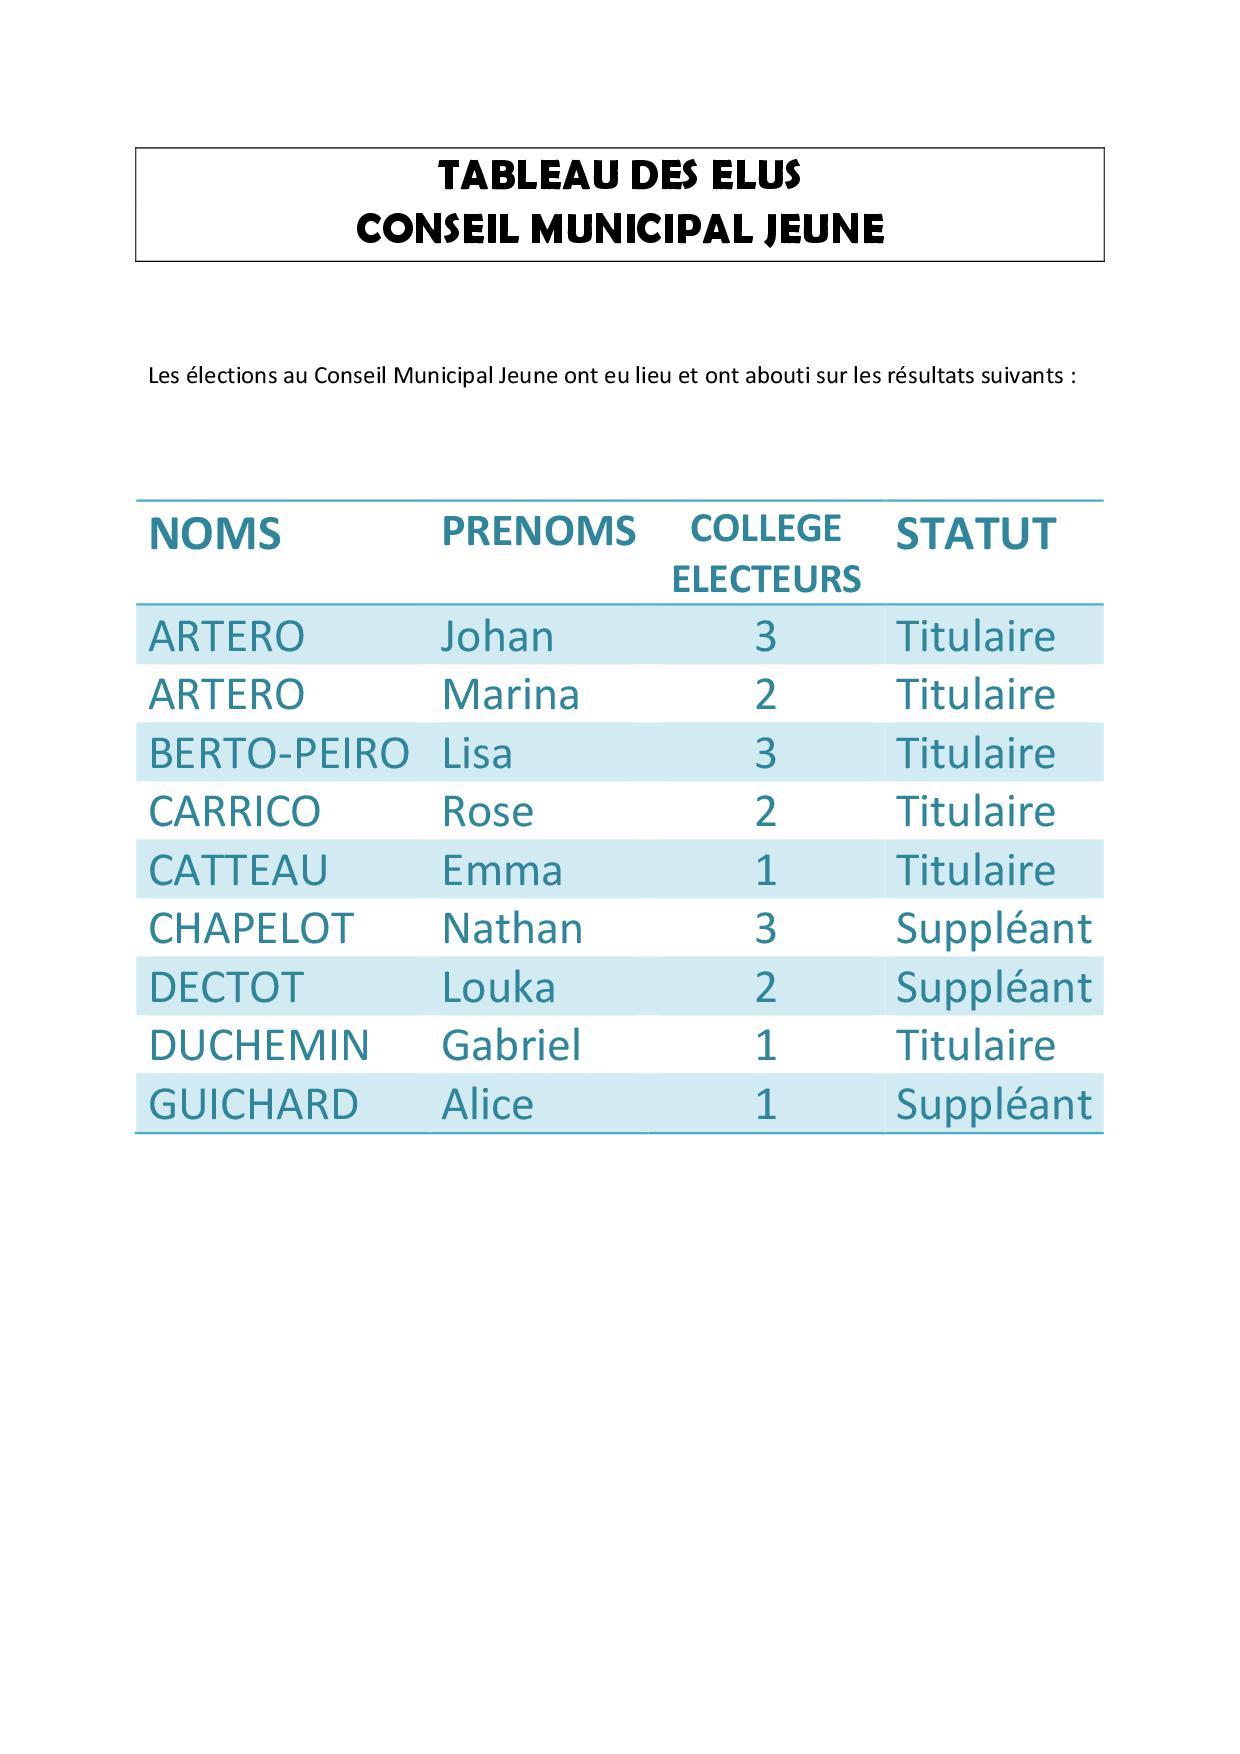 TABLEAU DES ELUS.jpg